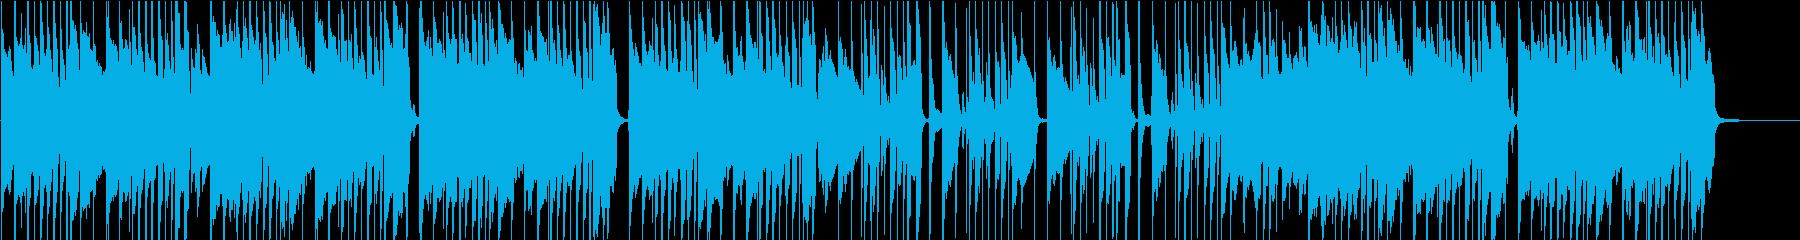 POPで多幸感のあるバンドサウンドの再生済みの波形